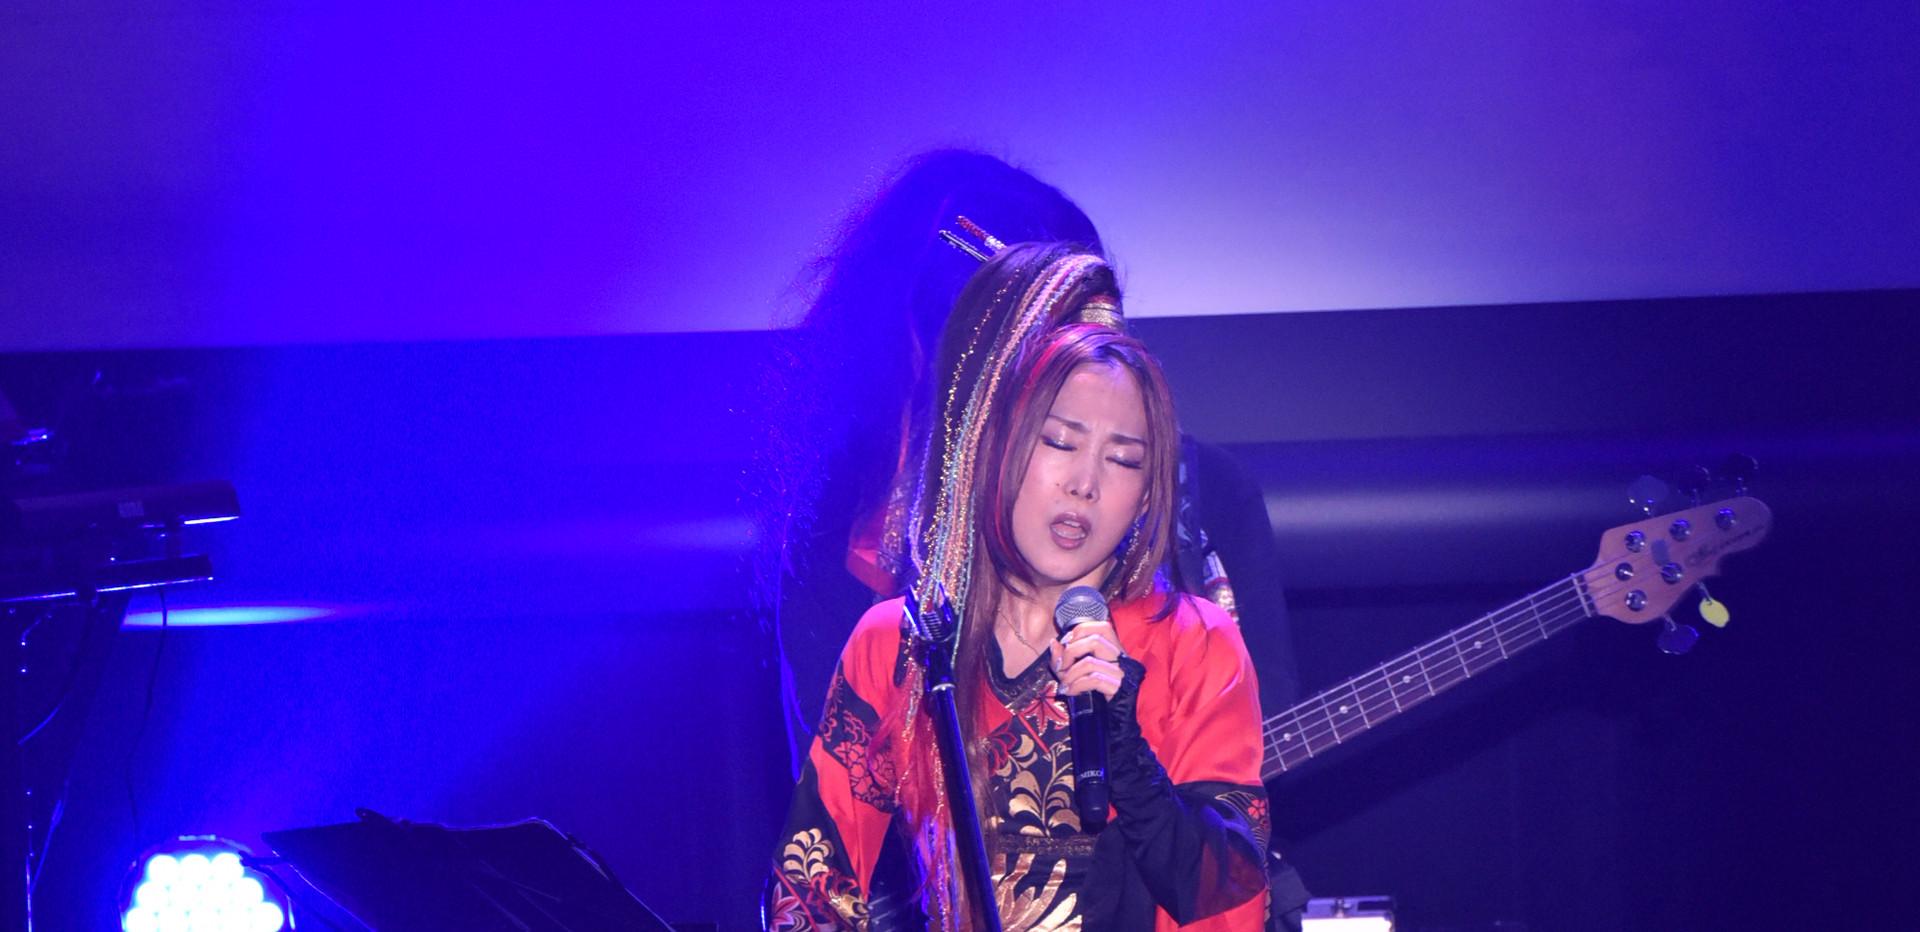 KumikoによるAmazing Grace